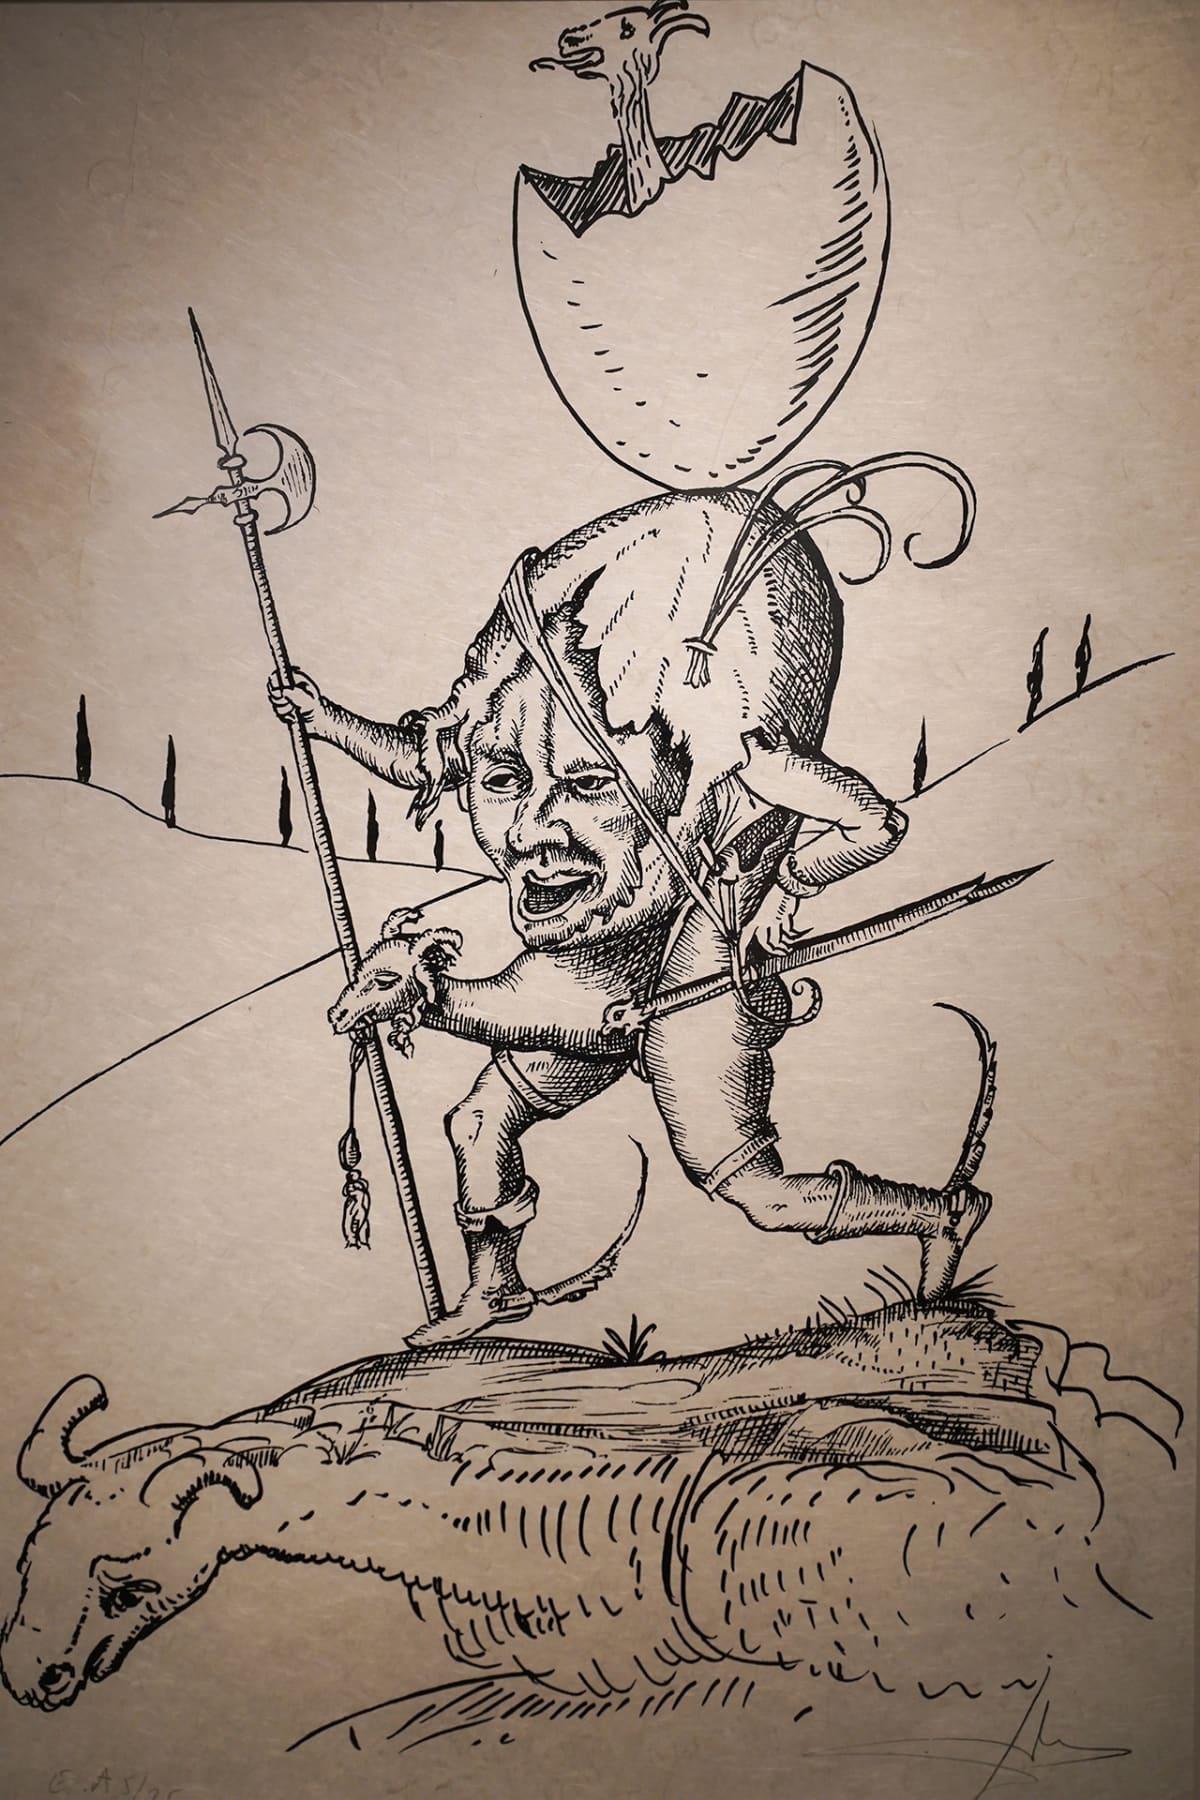 Salon taidemuseo, Salvador Dali, väärennös